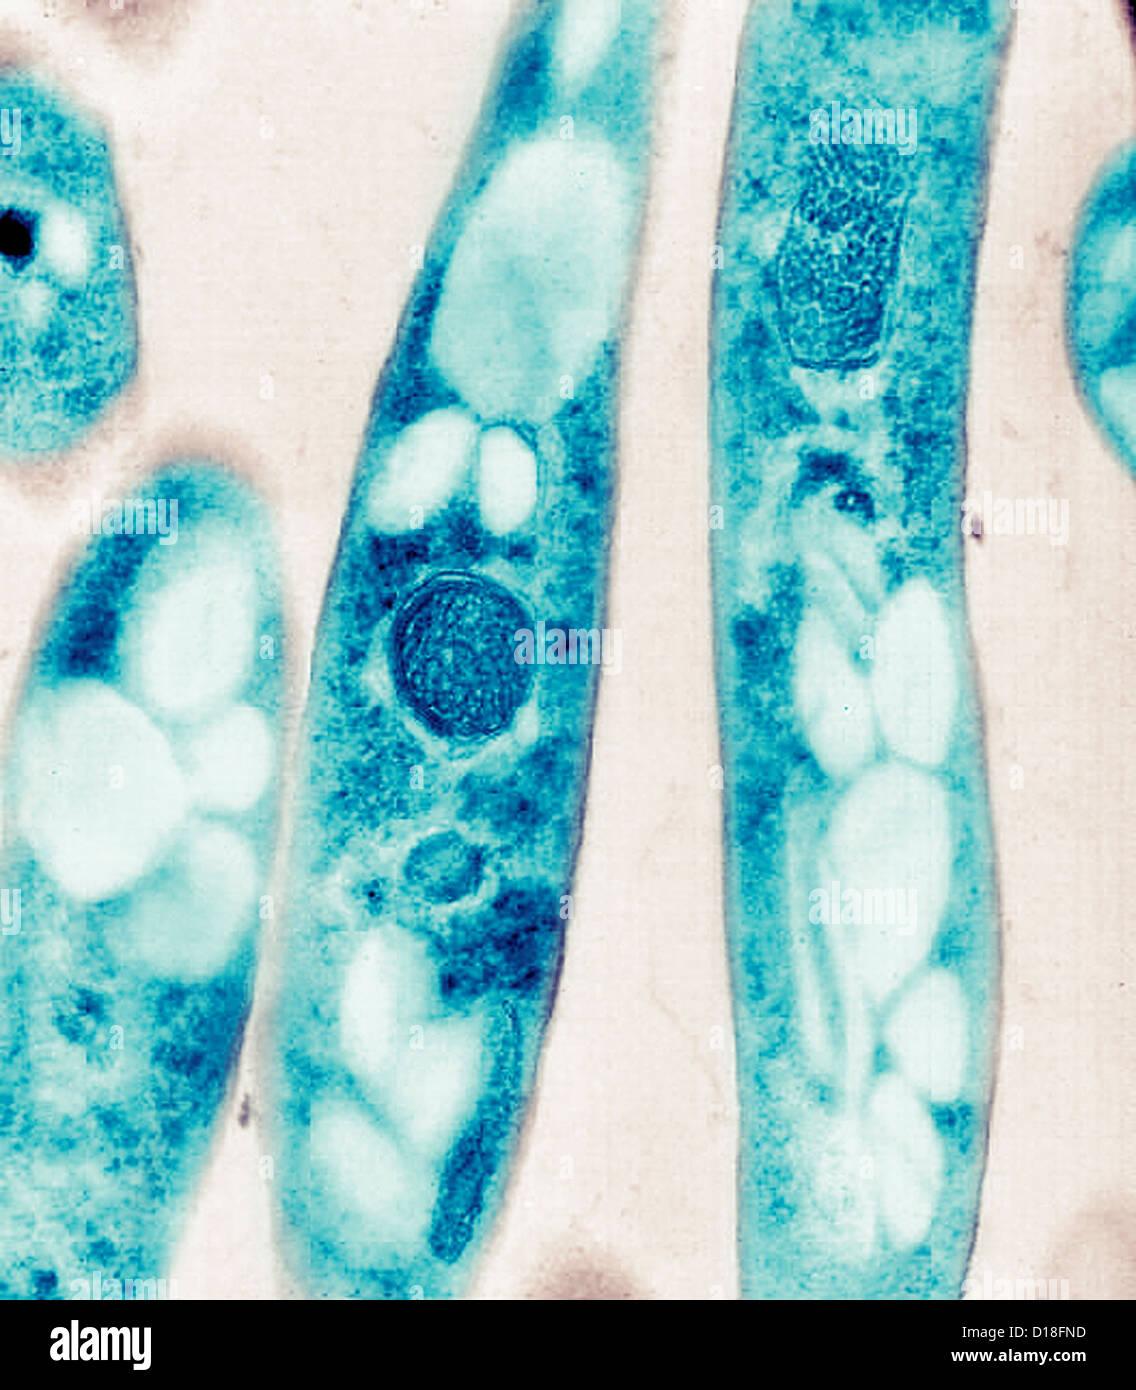 Electron micrograph of Bacillus anthracis bacteria - Stock Image